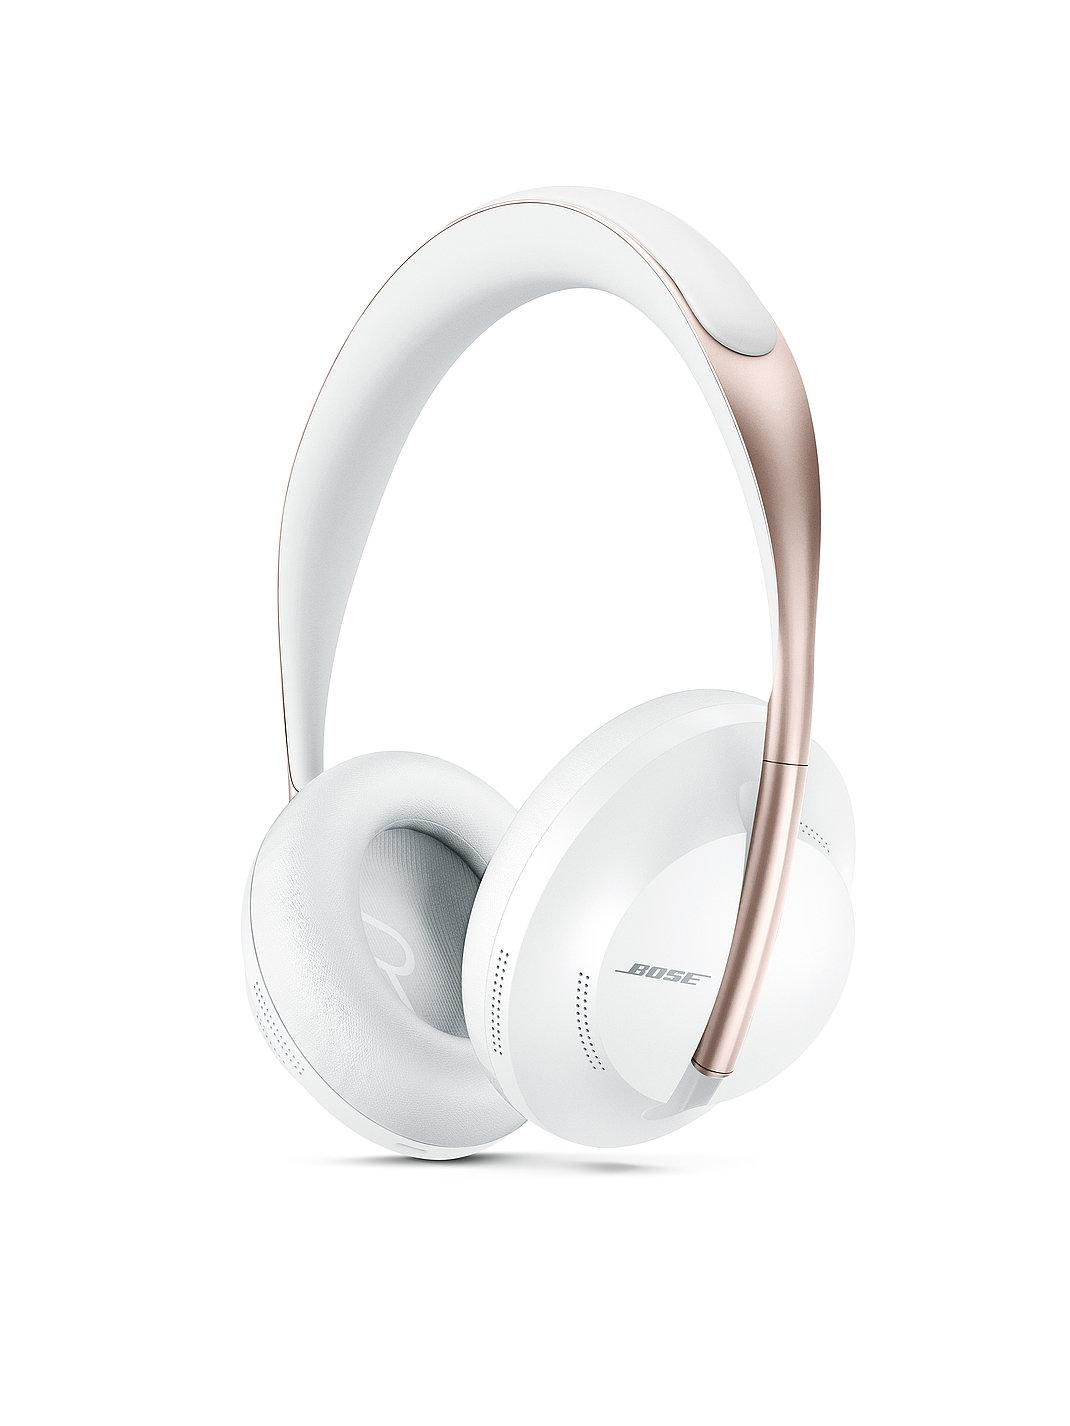 Bose Noise Cancelling Headphones 700 | Red Dot Design Award